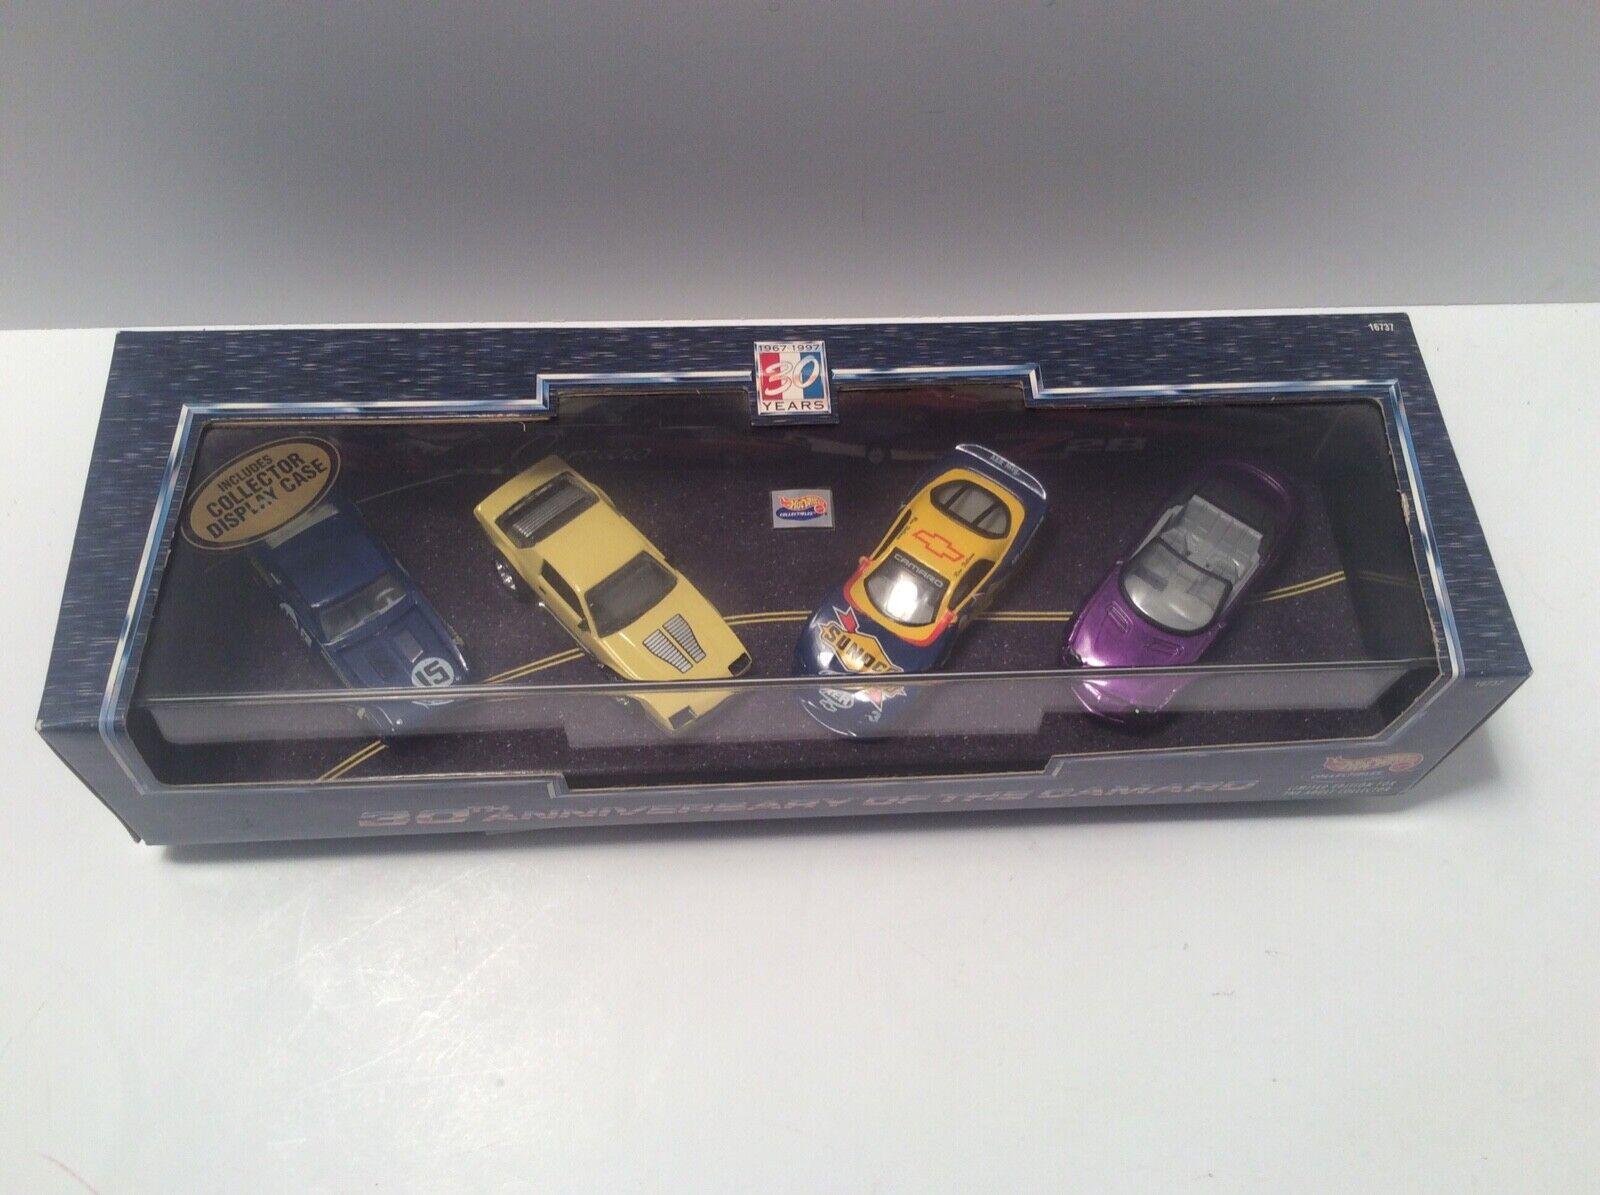 Hot Wheels 30th Anniversary of the Camaro (1967-1997) 4 car set